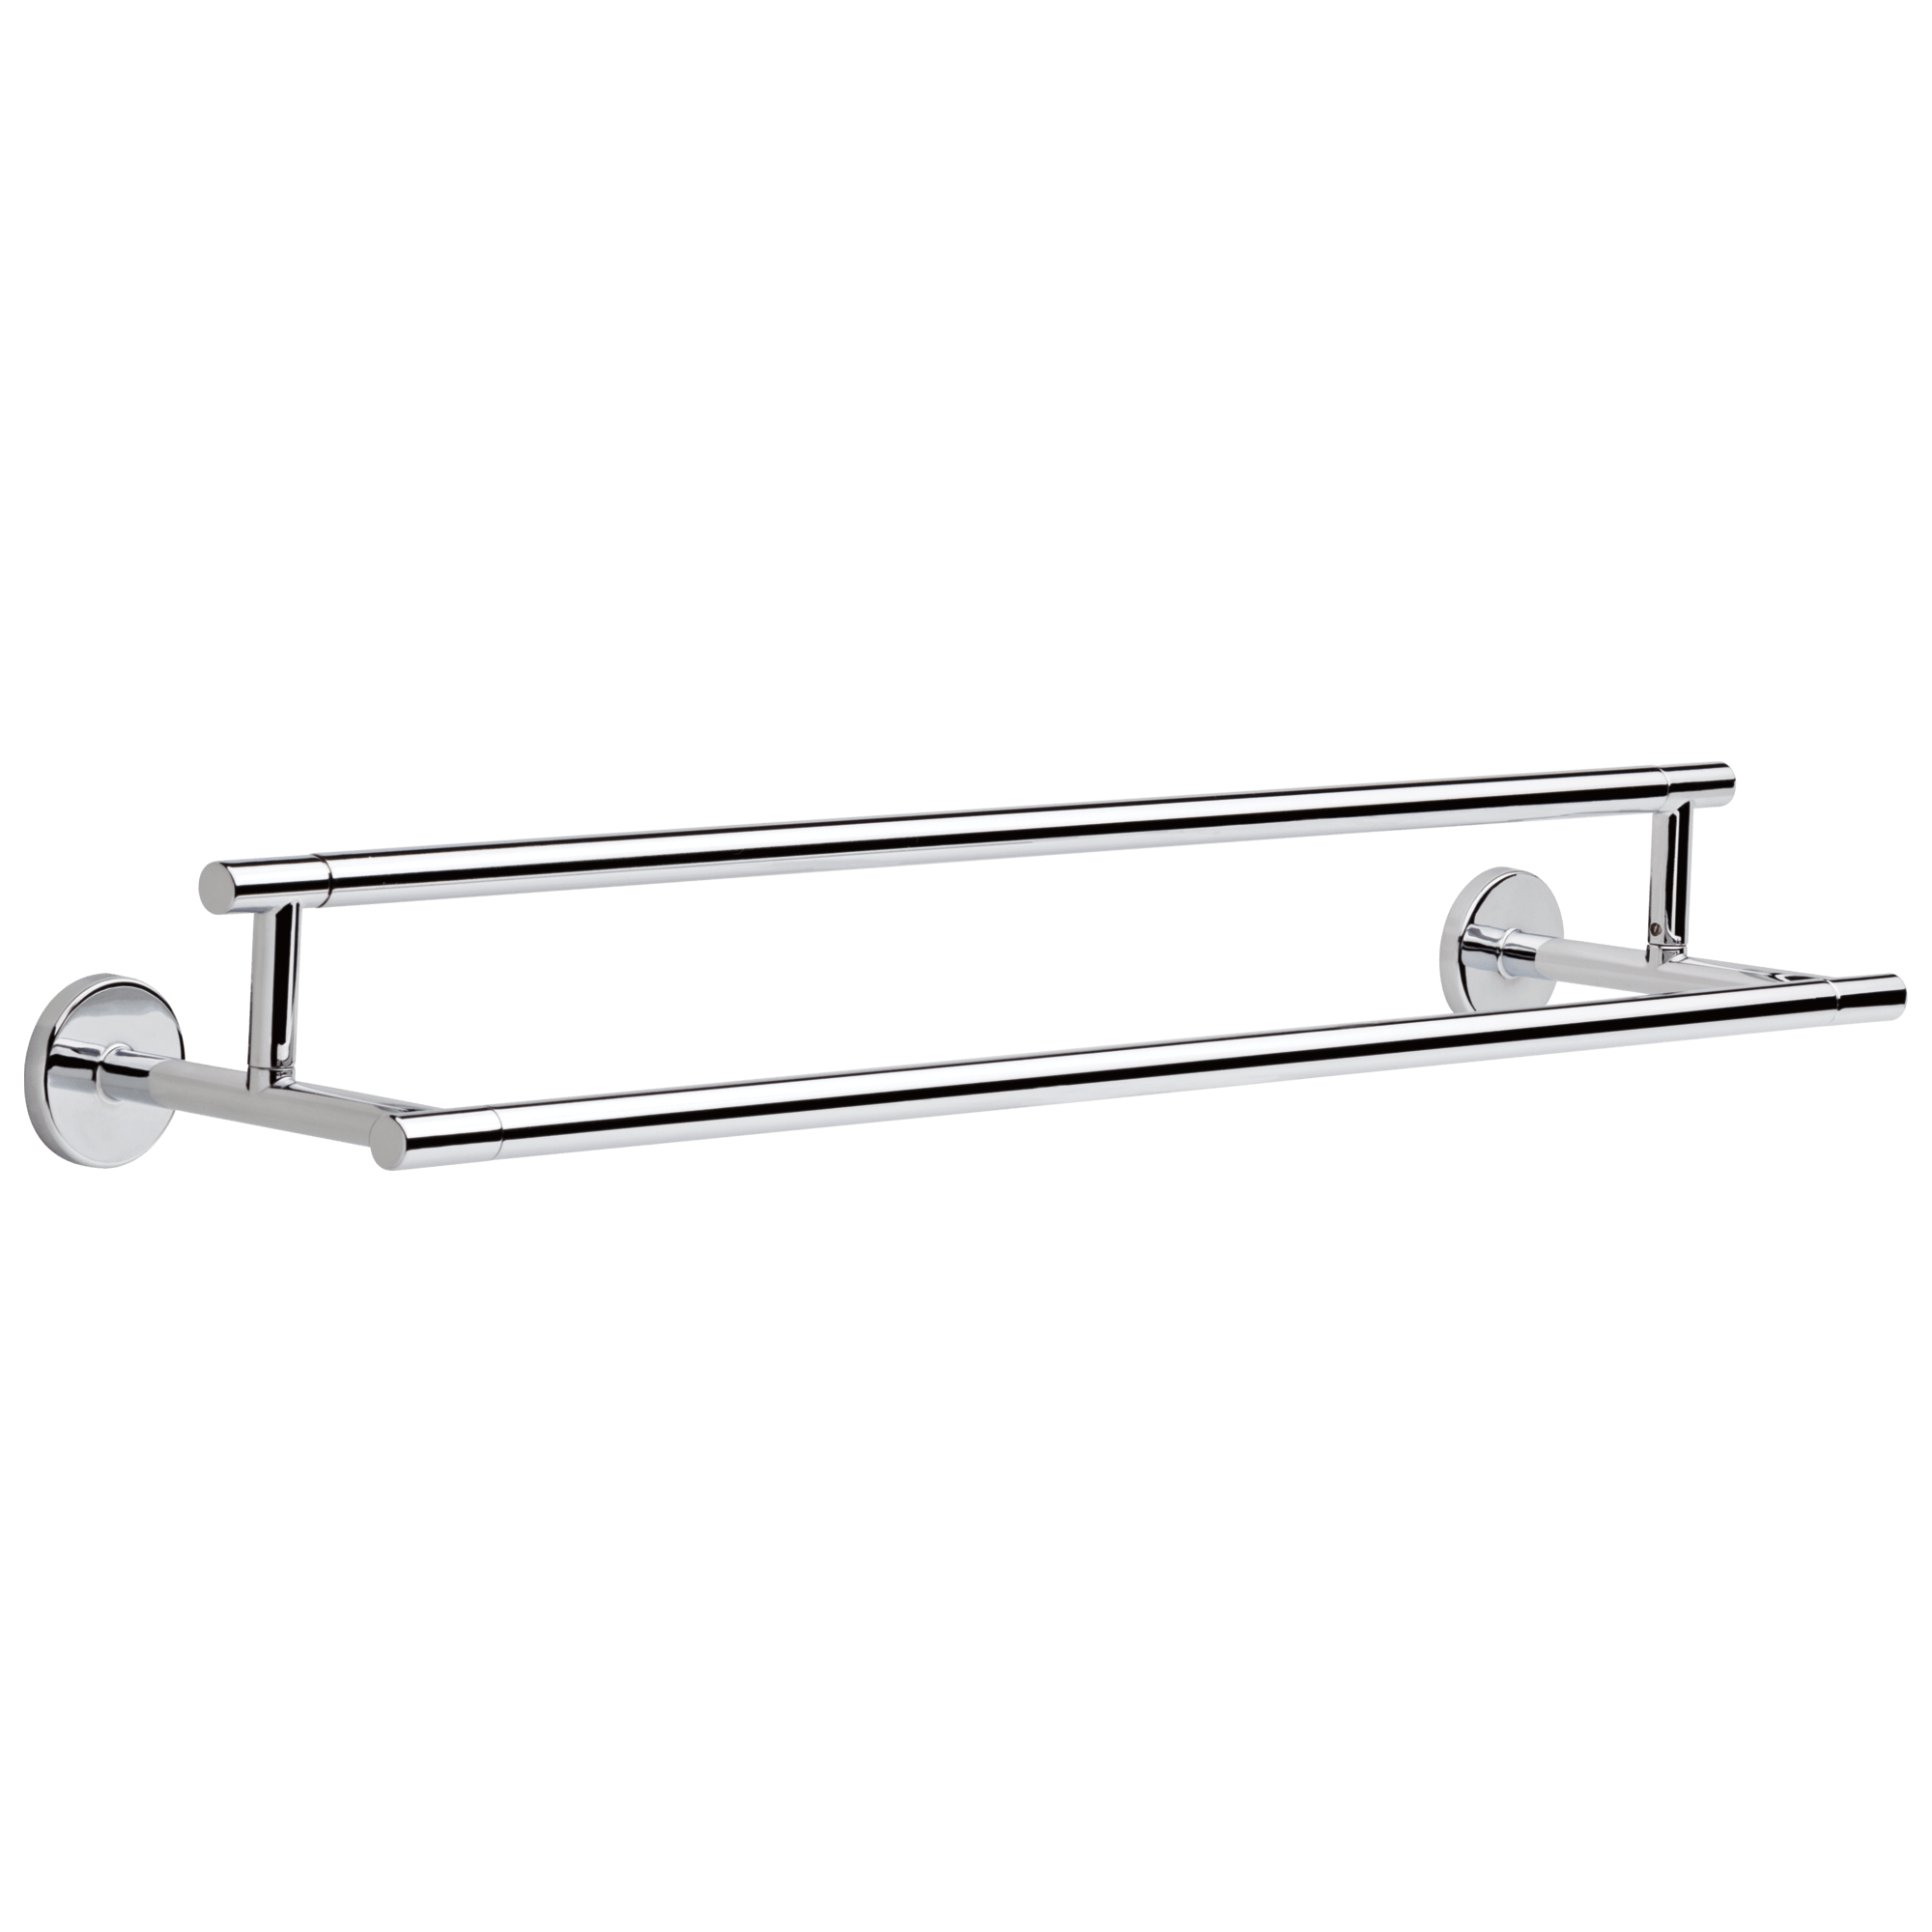 trinsic 24 double towel bar in chrome